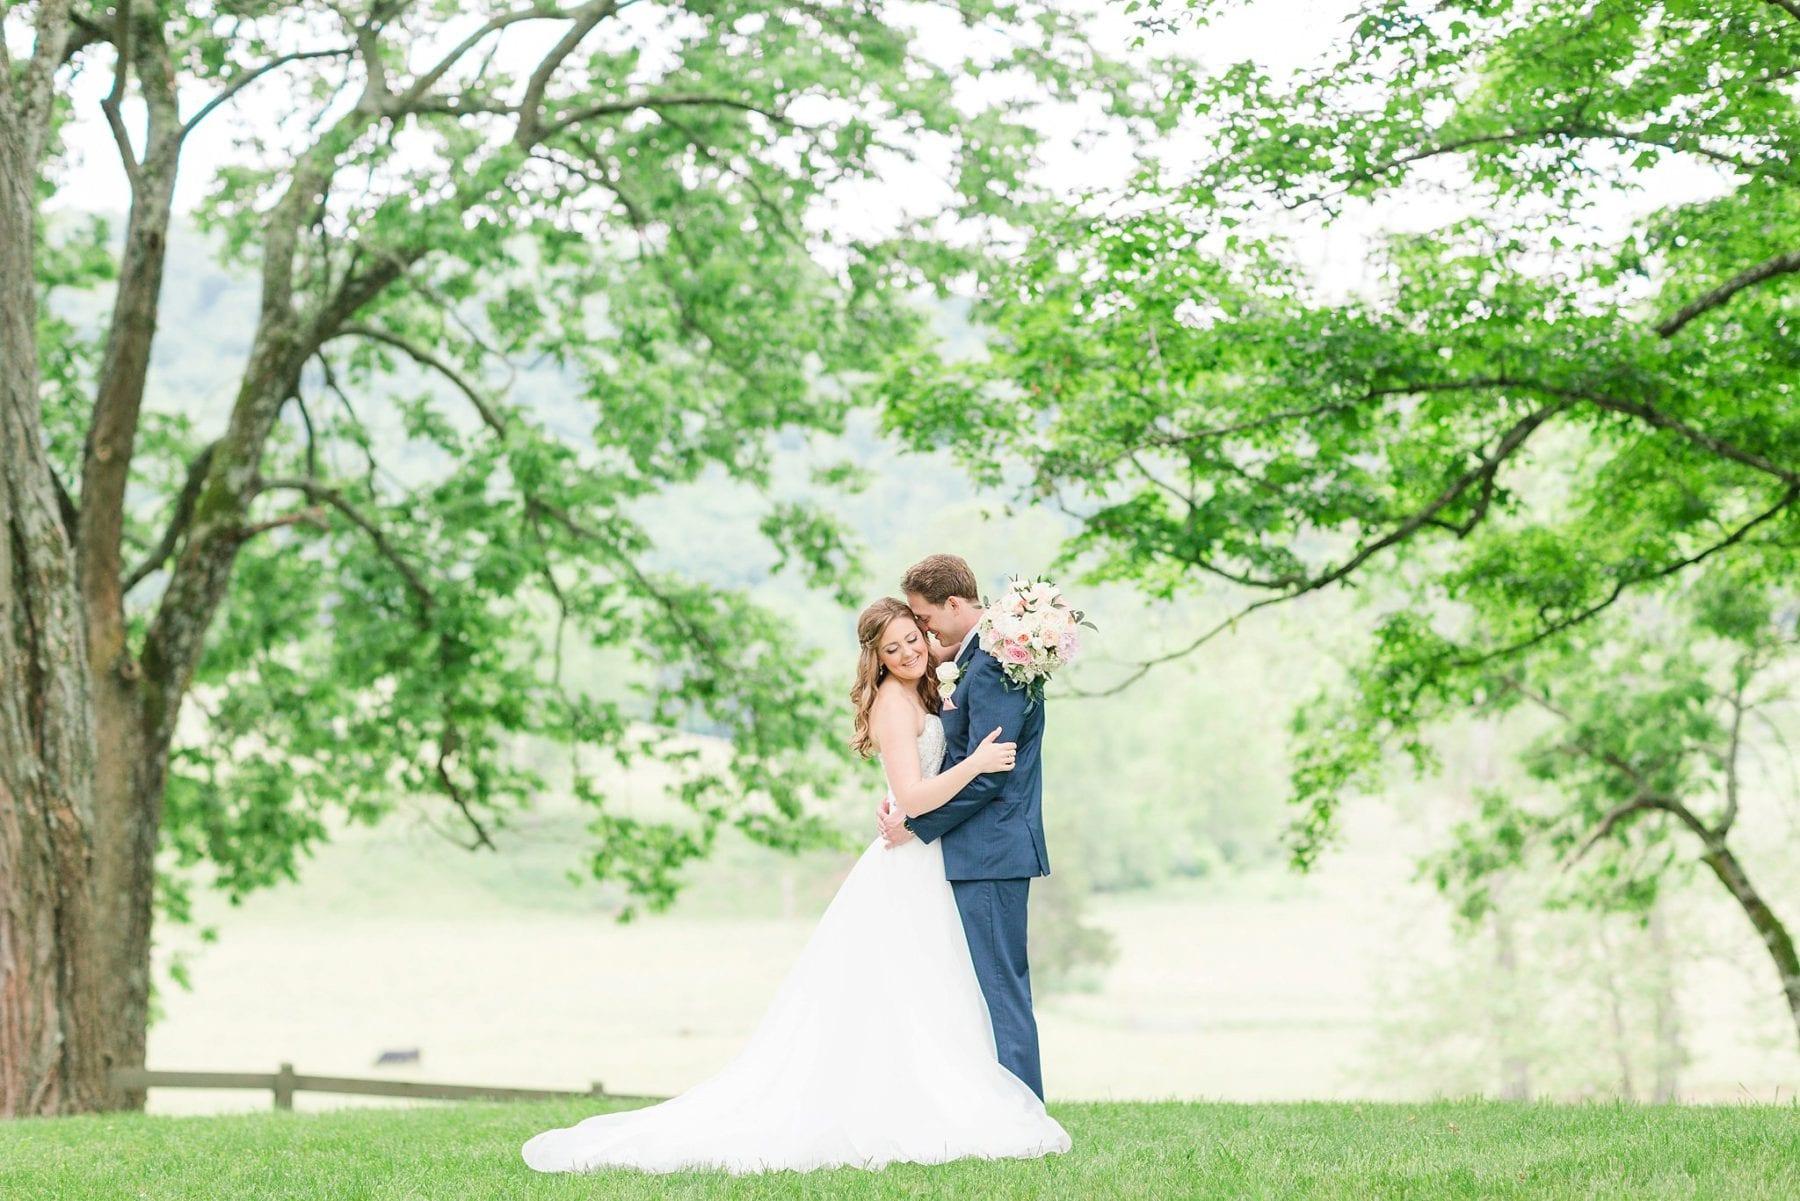 Justin & Megan Big Spring Farm Wedding Photos-173.jpg